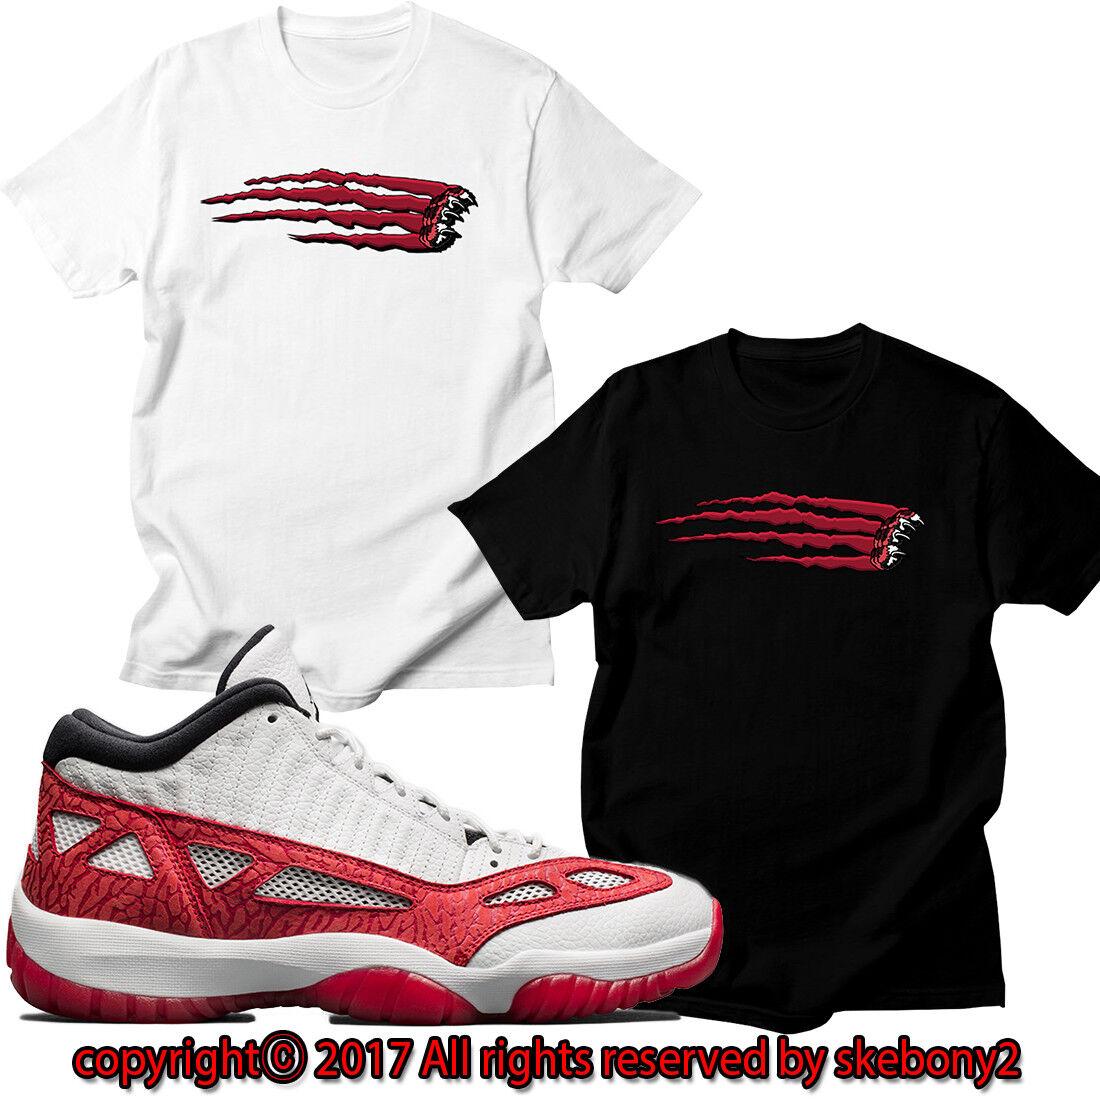 2ade36a6c705 Shirts To Match Jordan 5 Fire Red